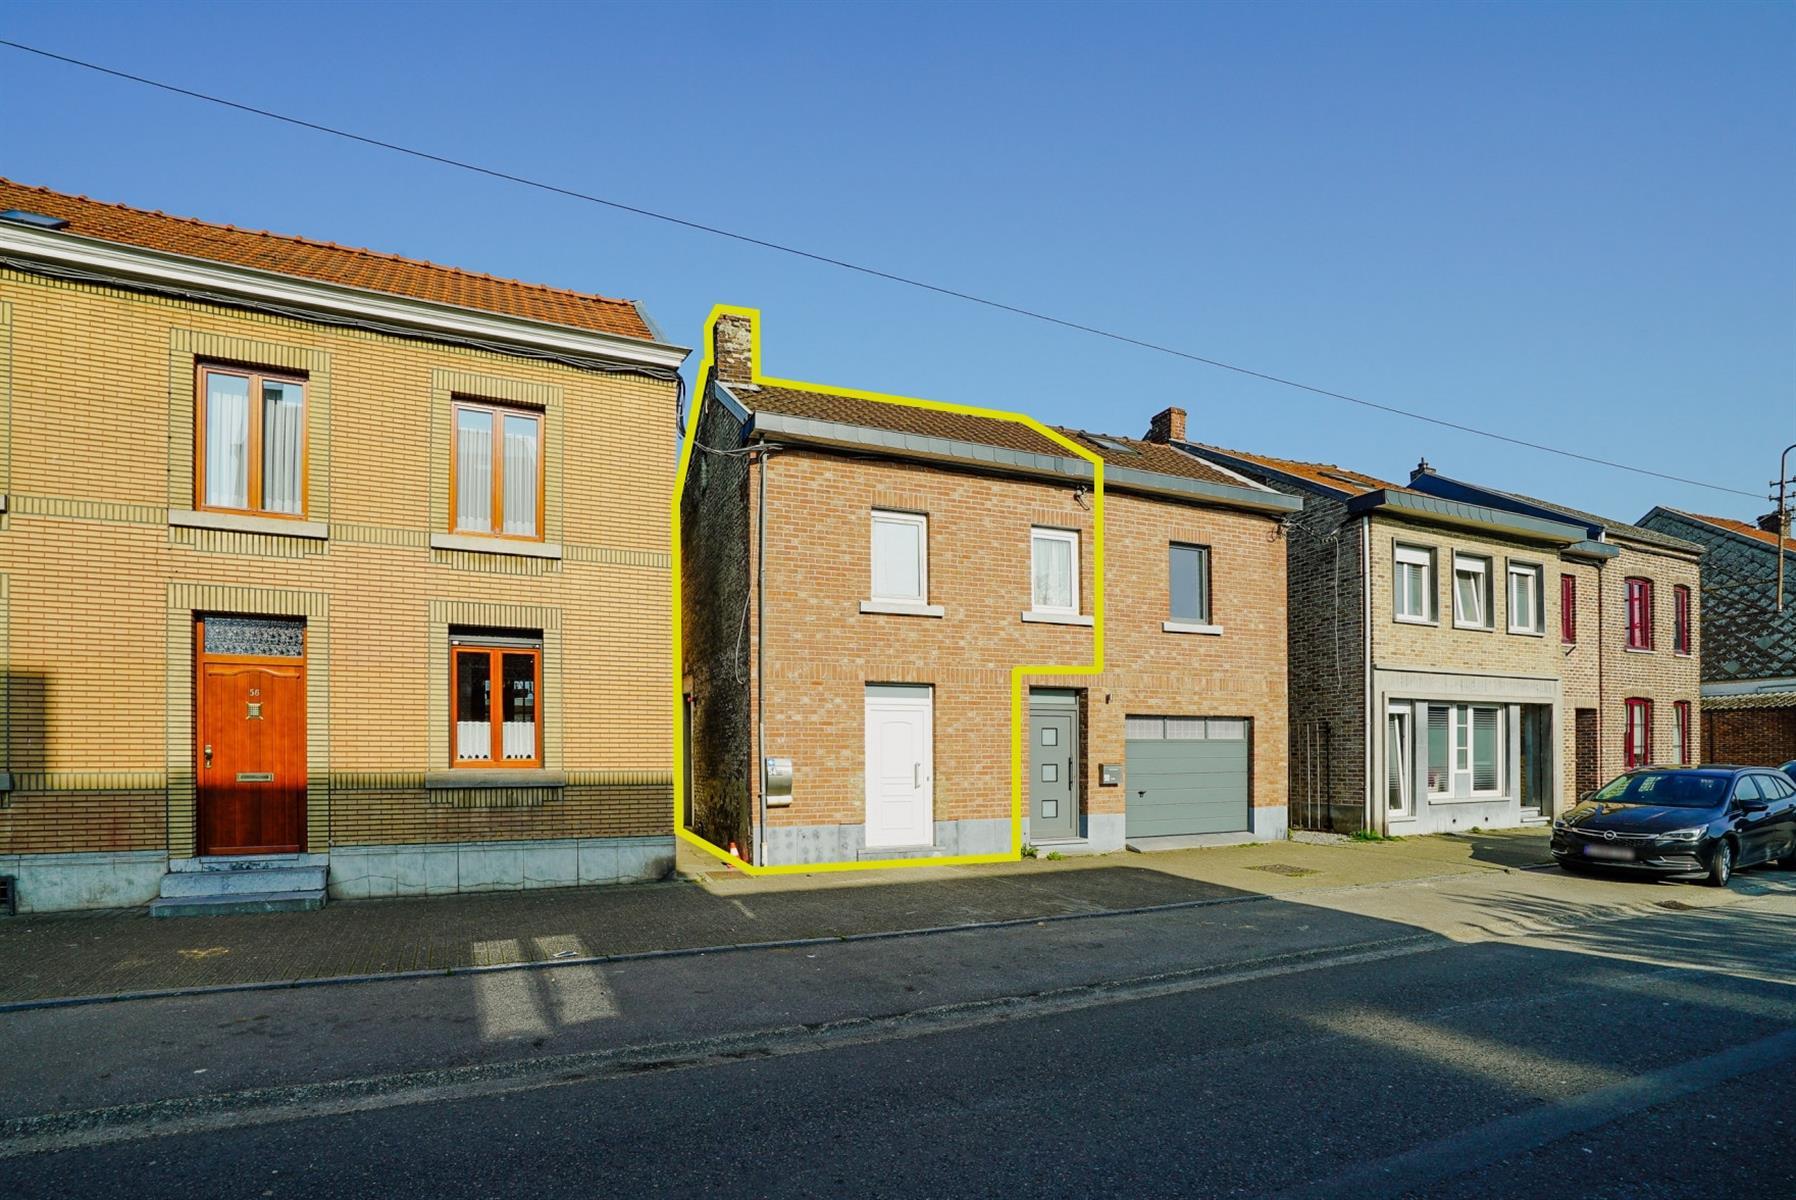 Maison - Oupeye Hermallesous-Argenteau - #4324098-0